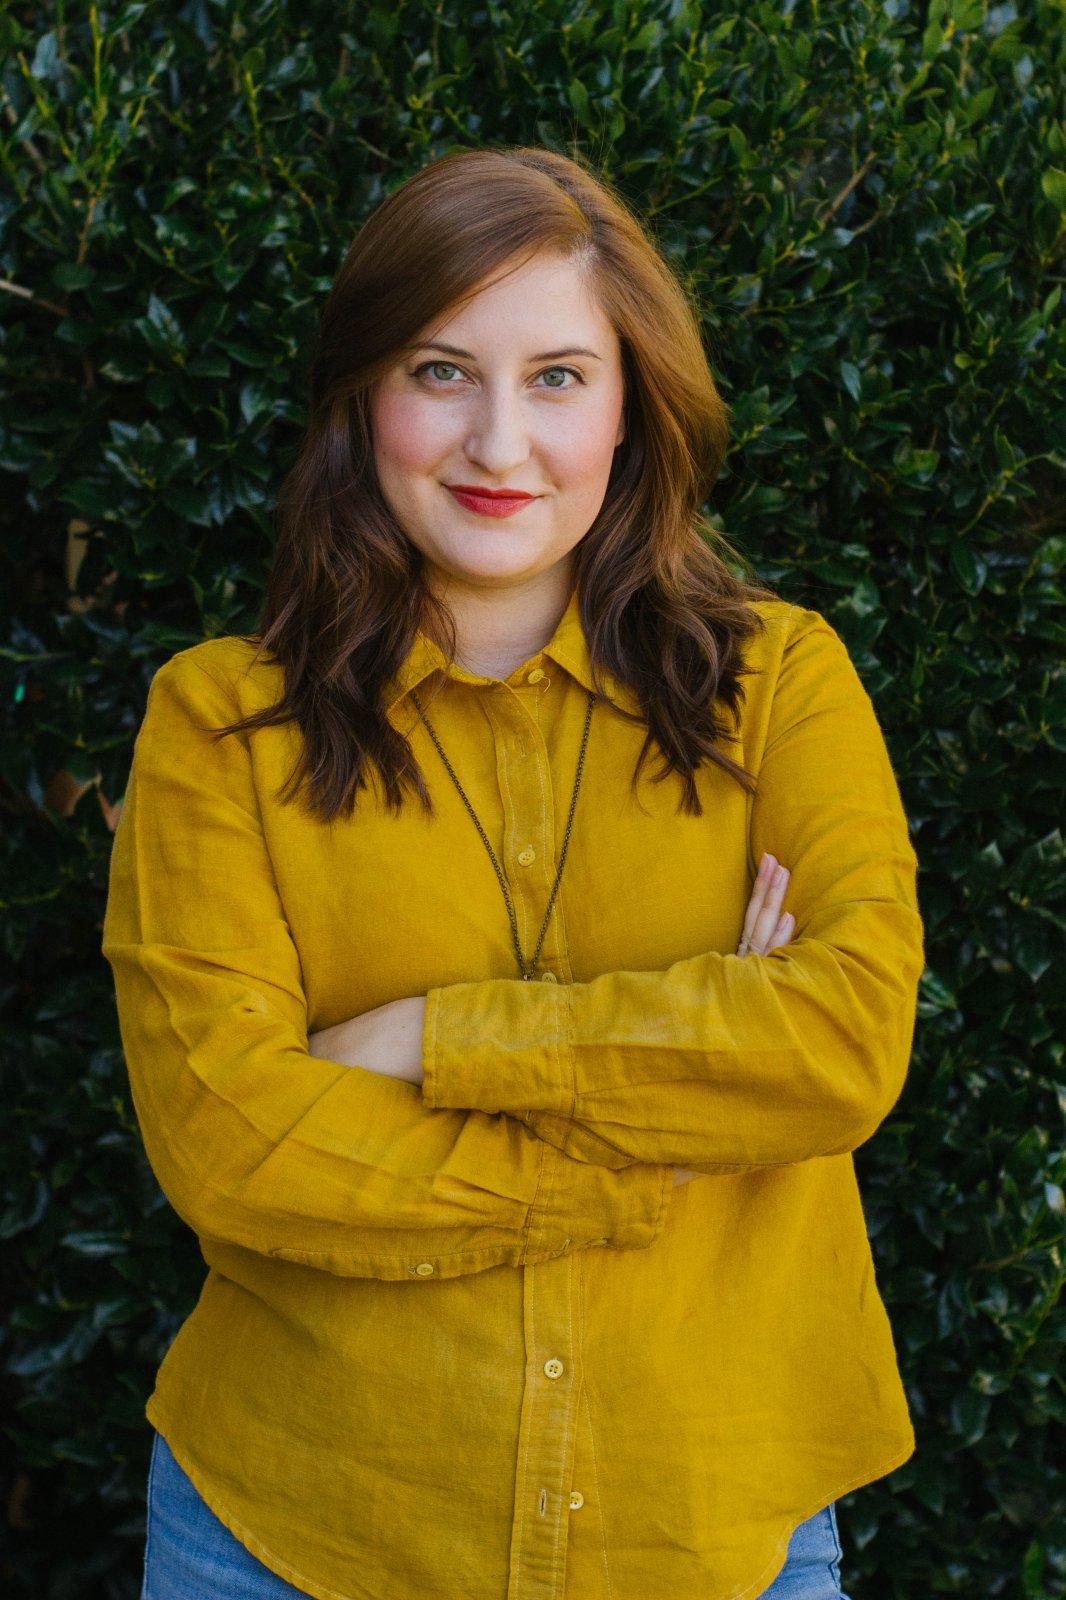 Fiberside Chats: Hannah Thiessen June 20th